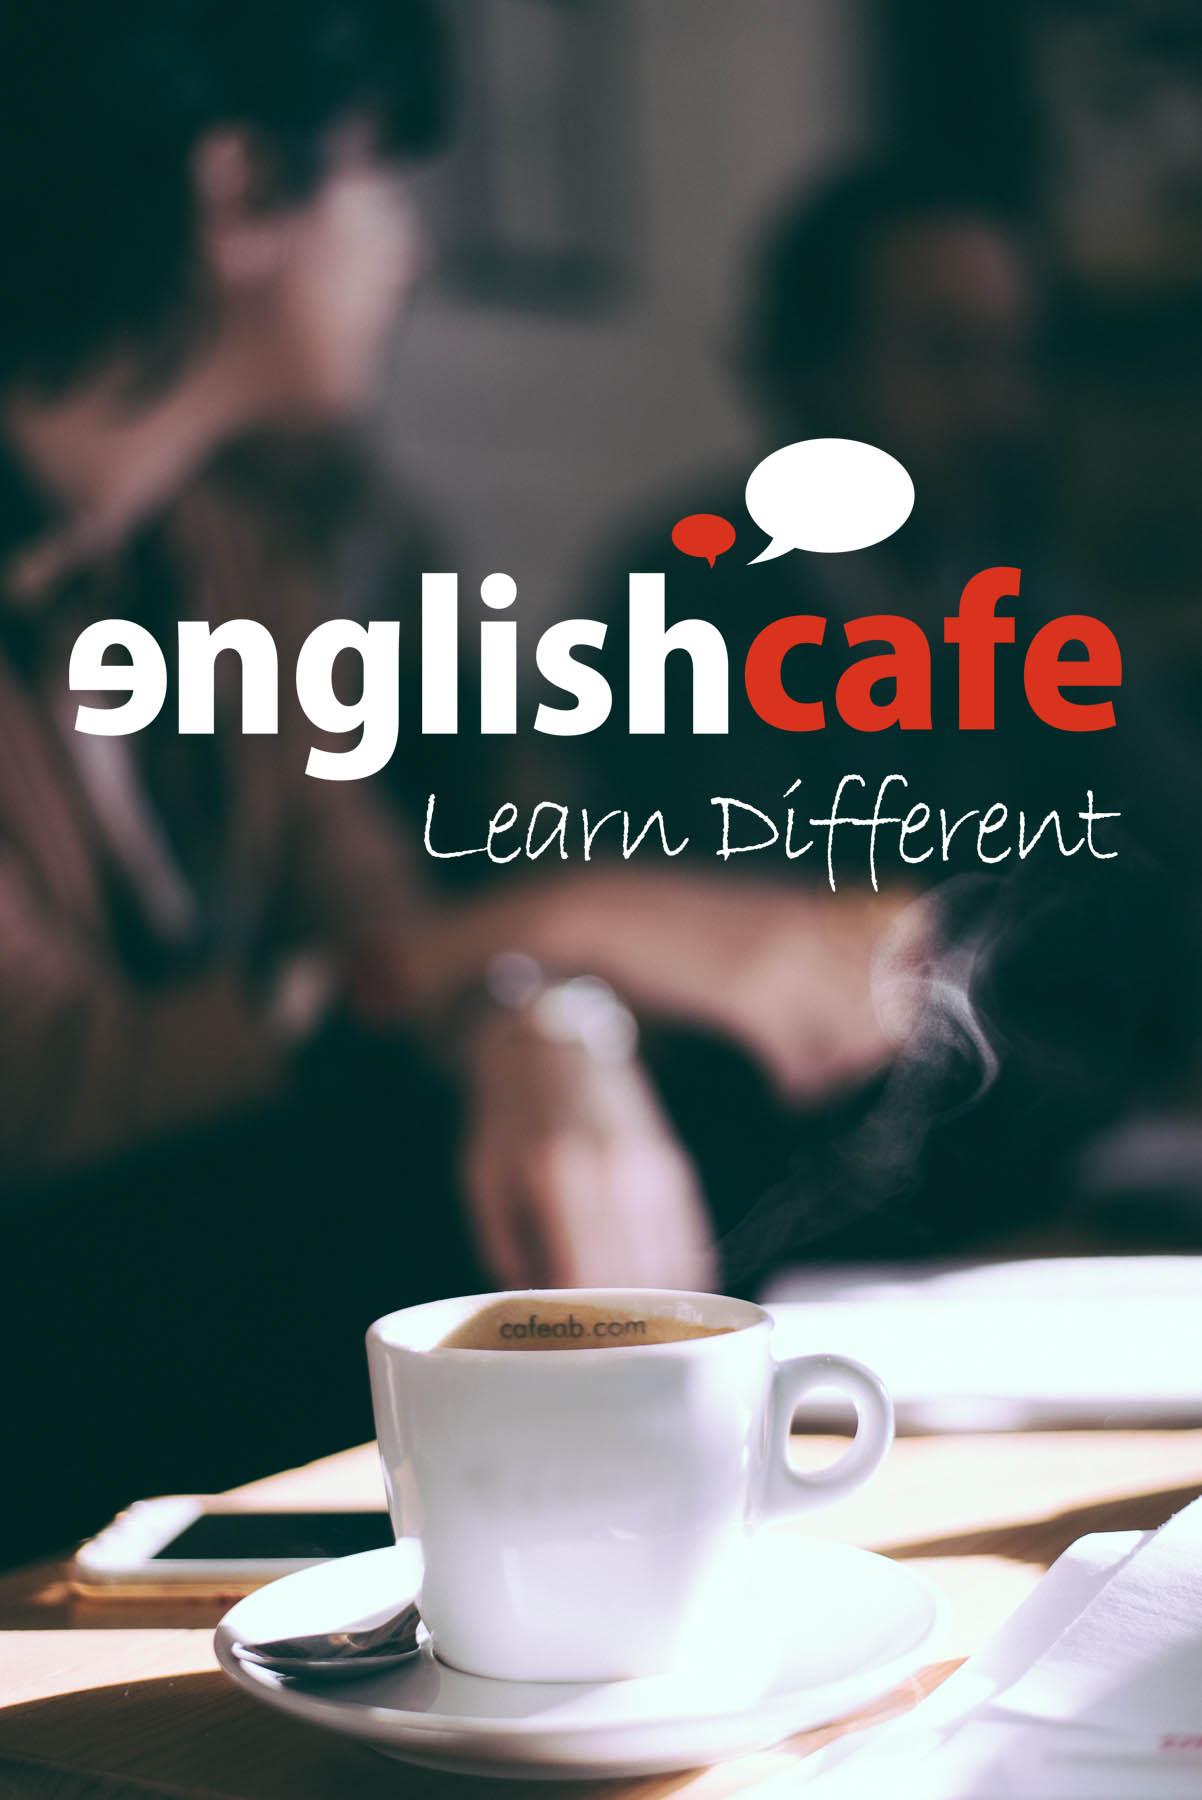 Englishcafe. Clases de inglés diferentes